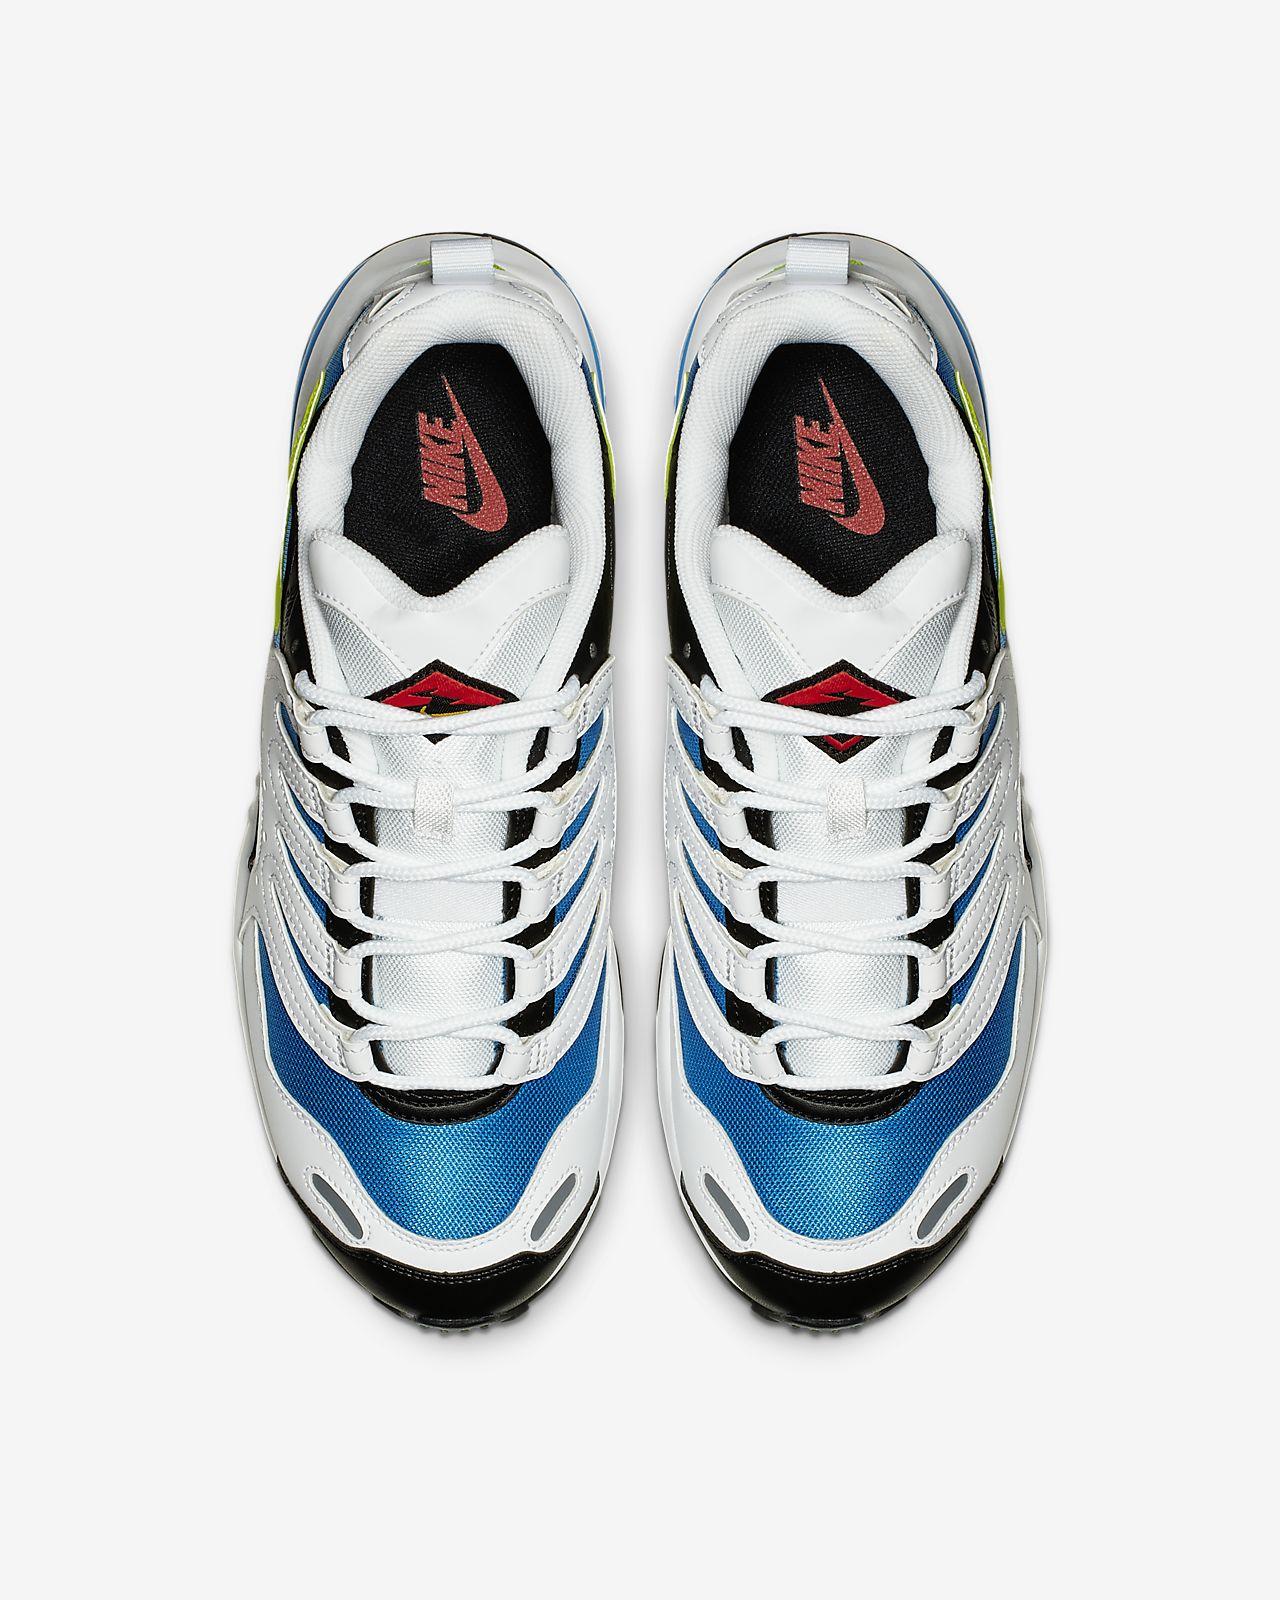 Nike Air Terra Humara 18 Men's Shoe